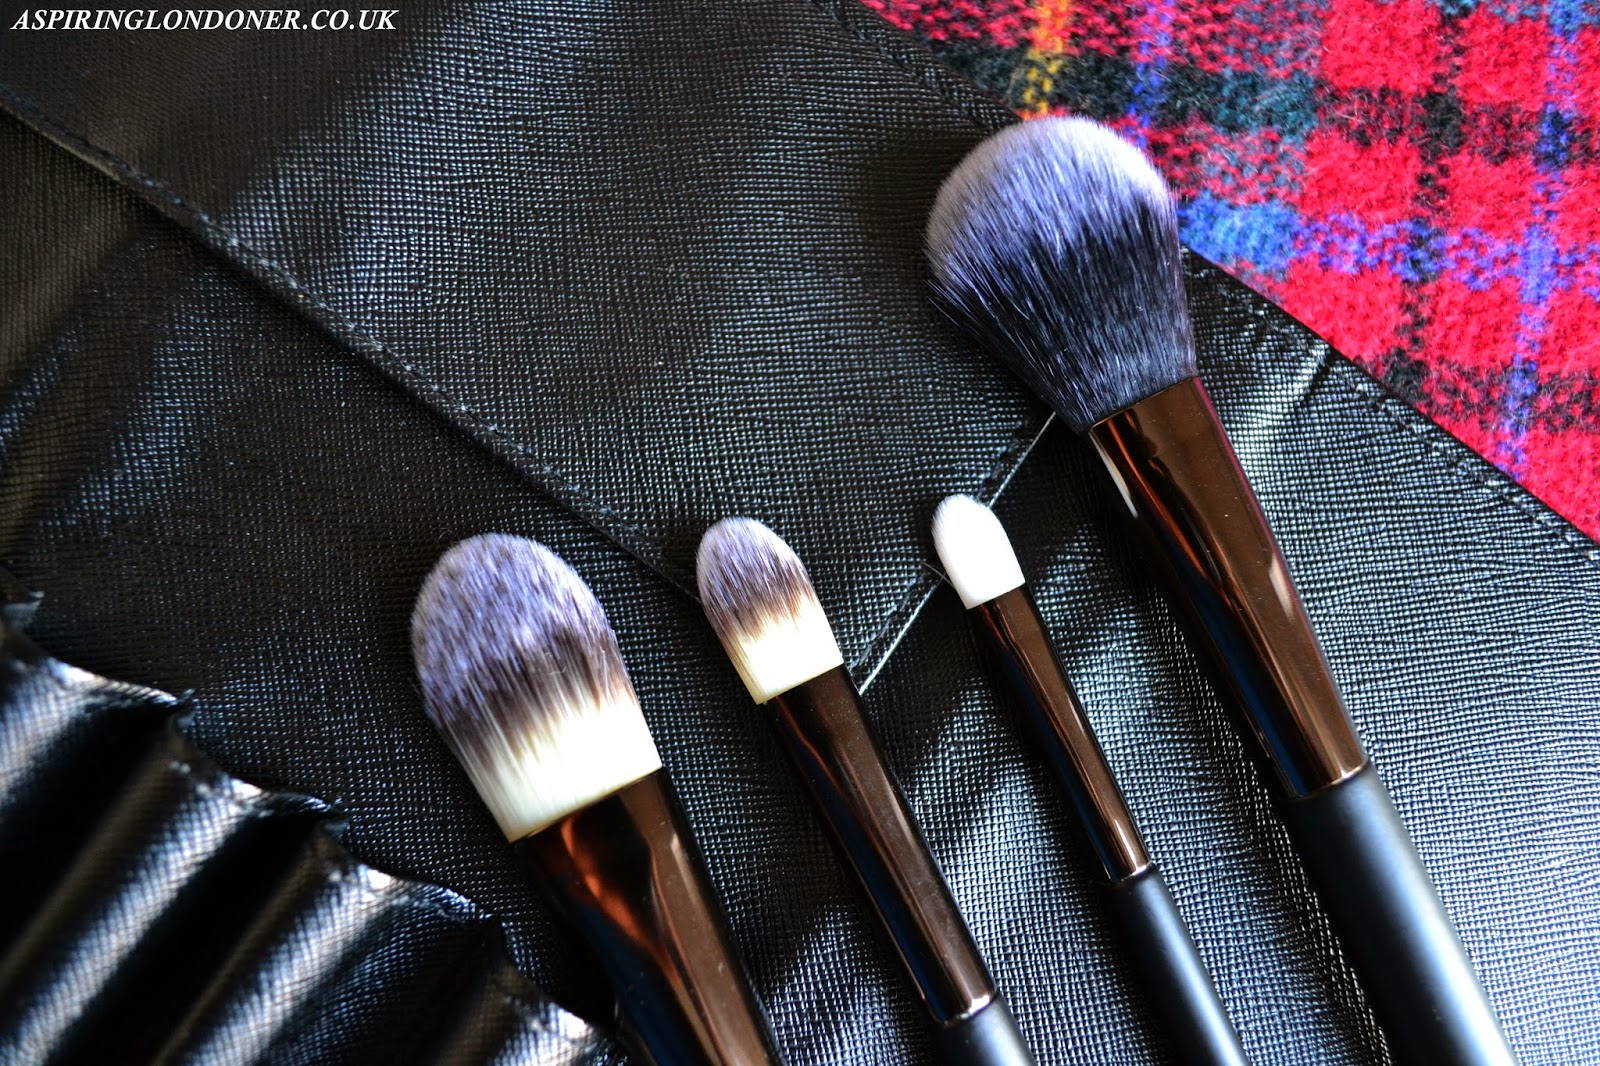 No7 Core Collection Brush Set Review - Aspiring Londoner